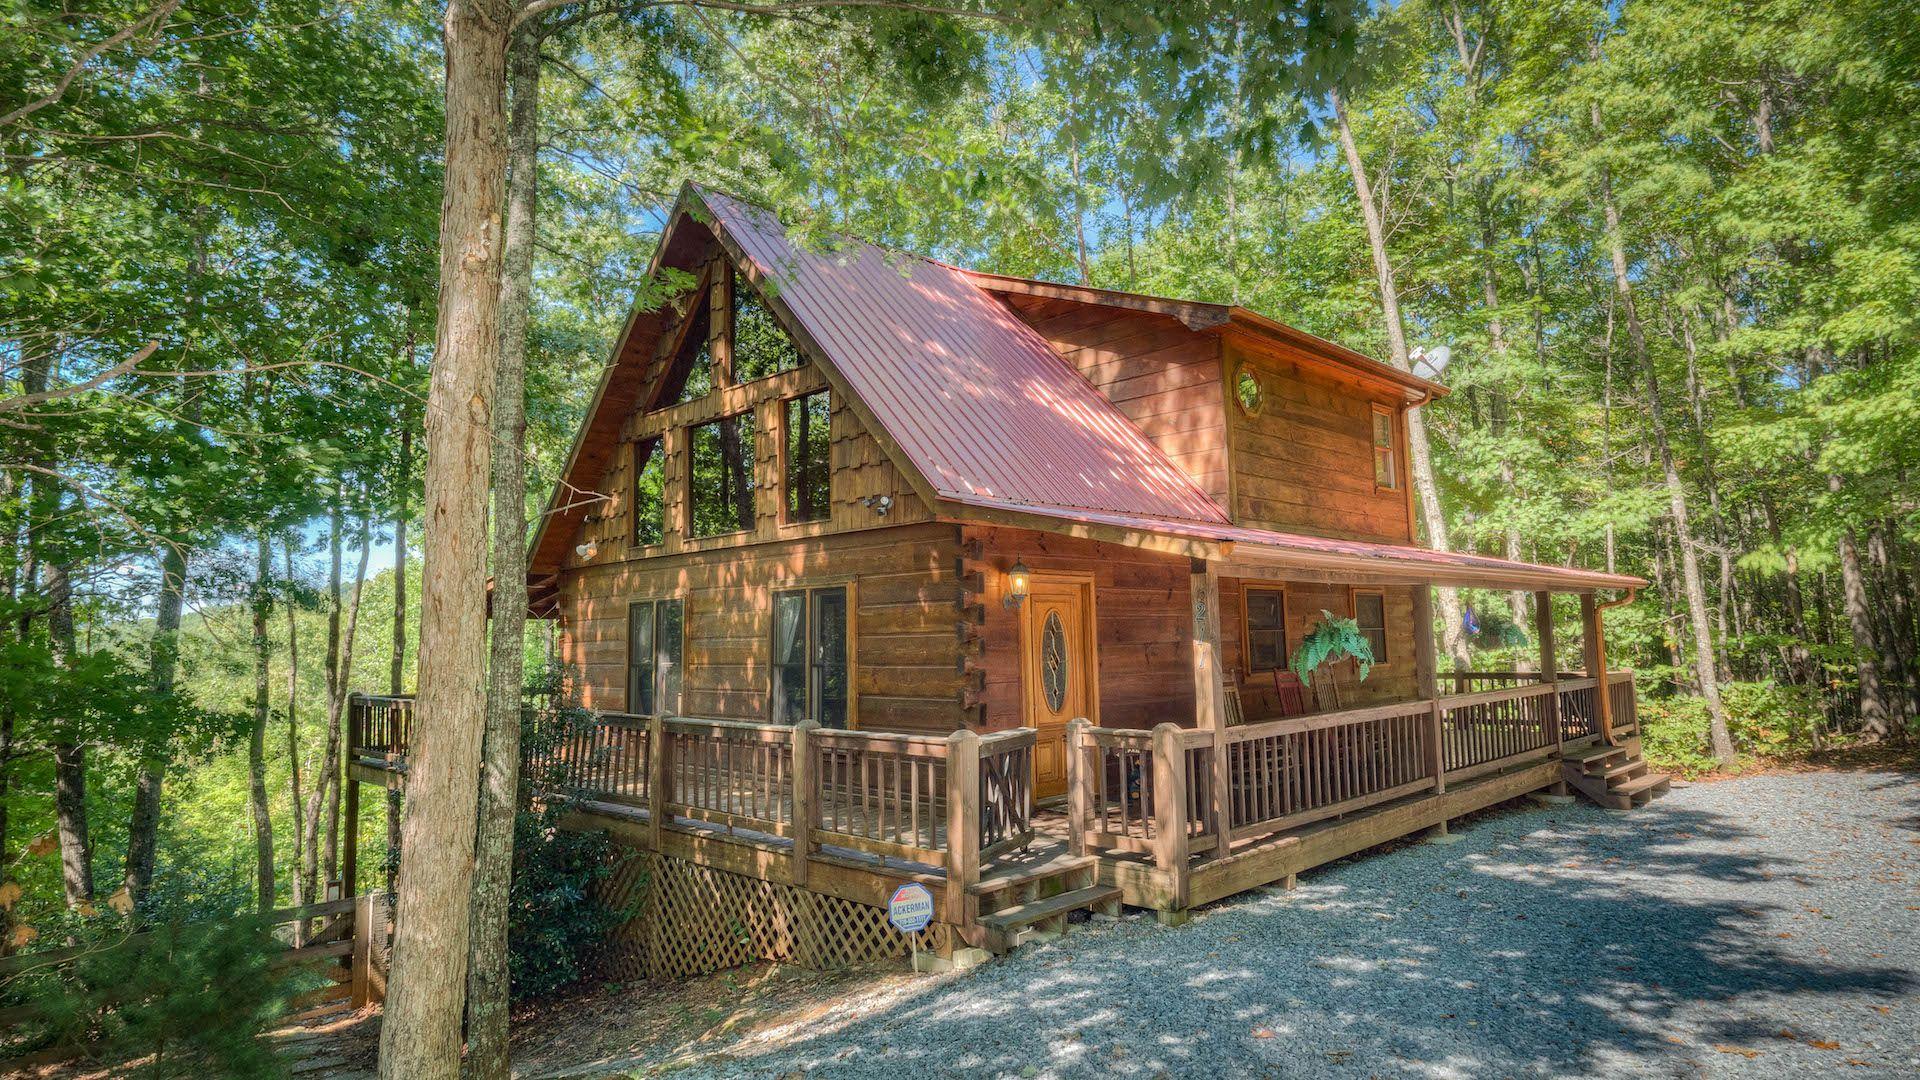 Romantic cabins in north georgia mountains